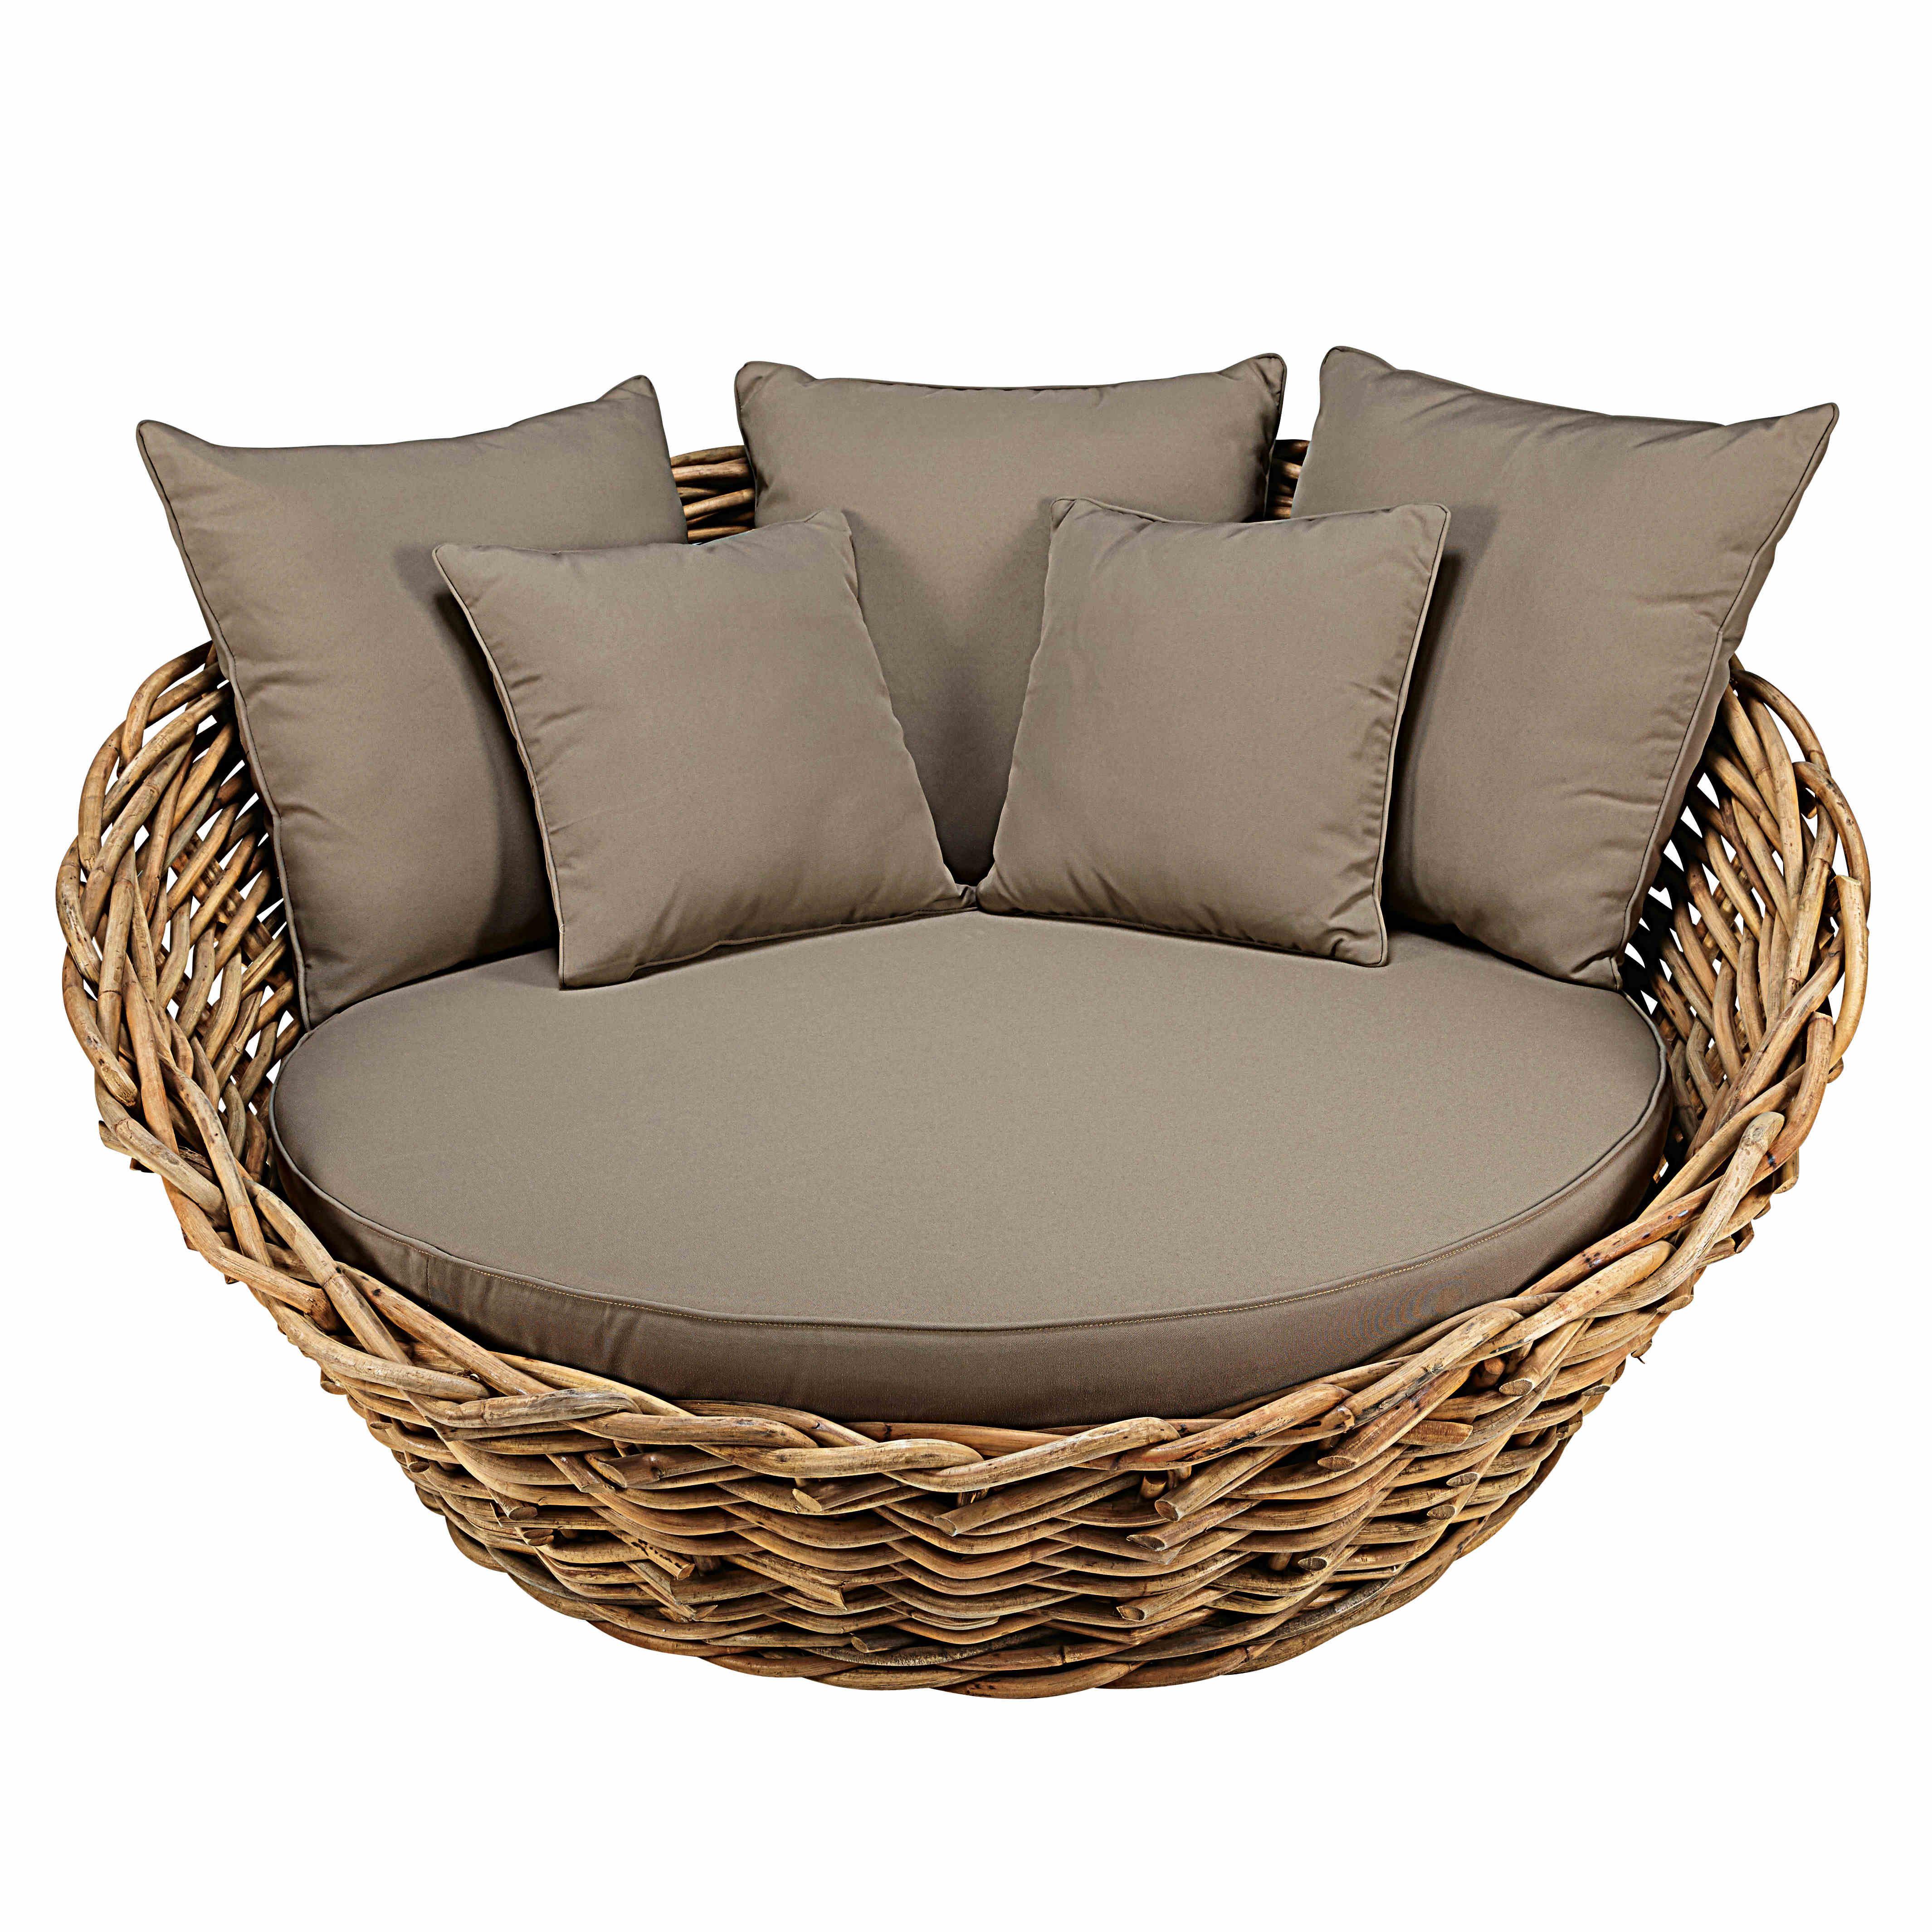 sof redondo de jard n de mimbre y cojines marrones st tropez muebles casa pinterest. Black Bedroom Furniture Sets. Home Design Ideas